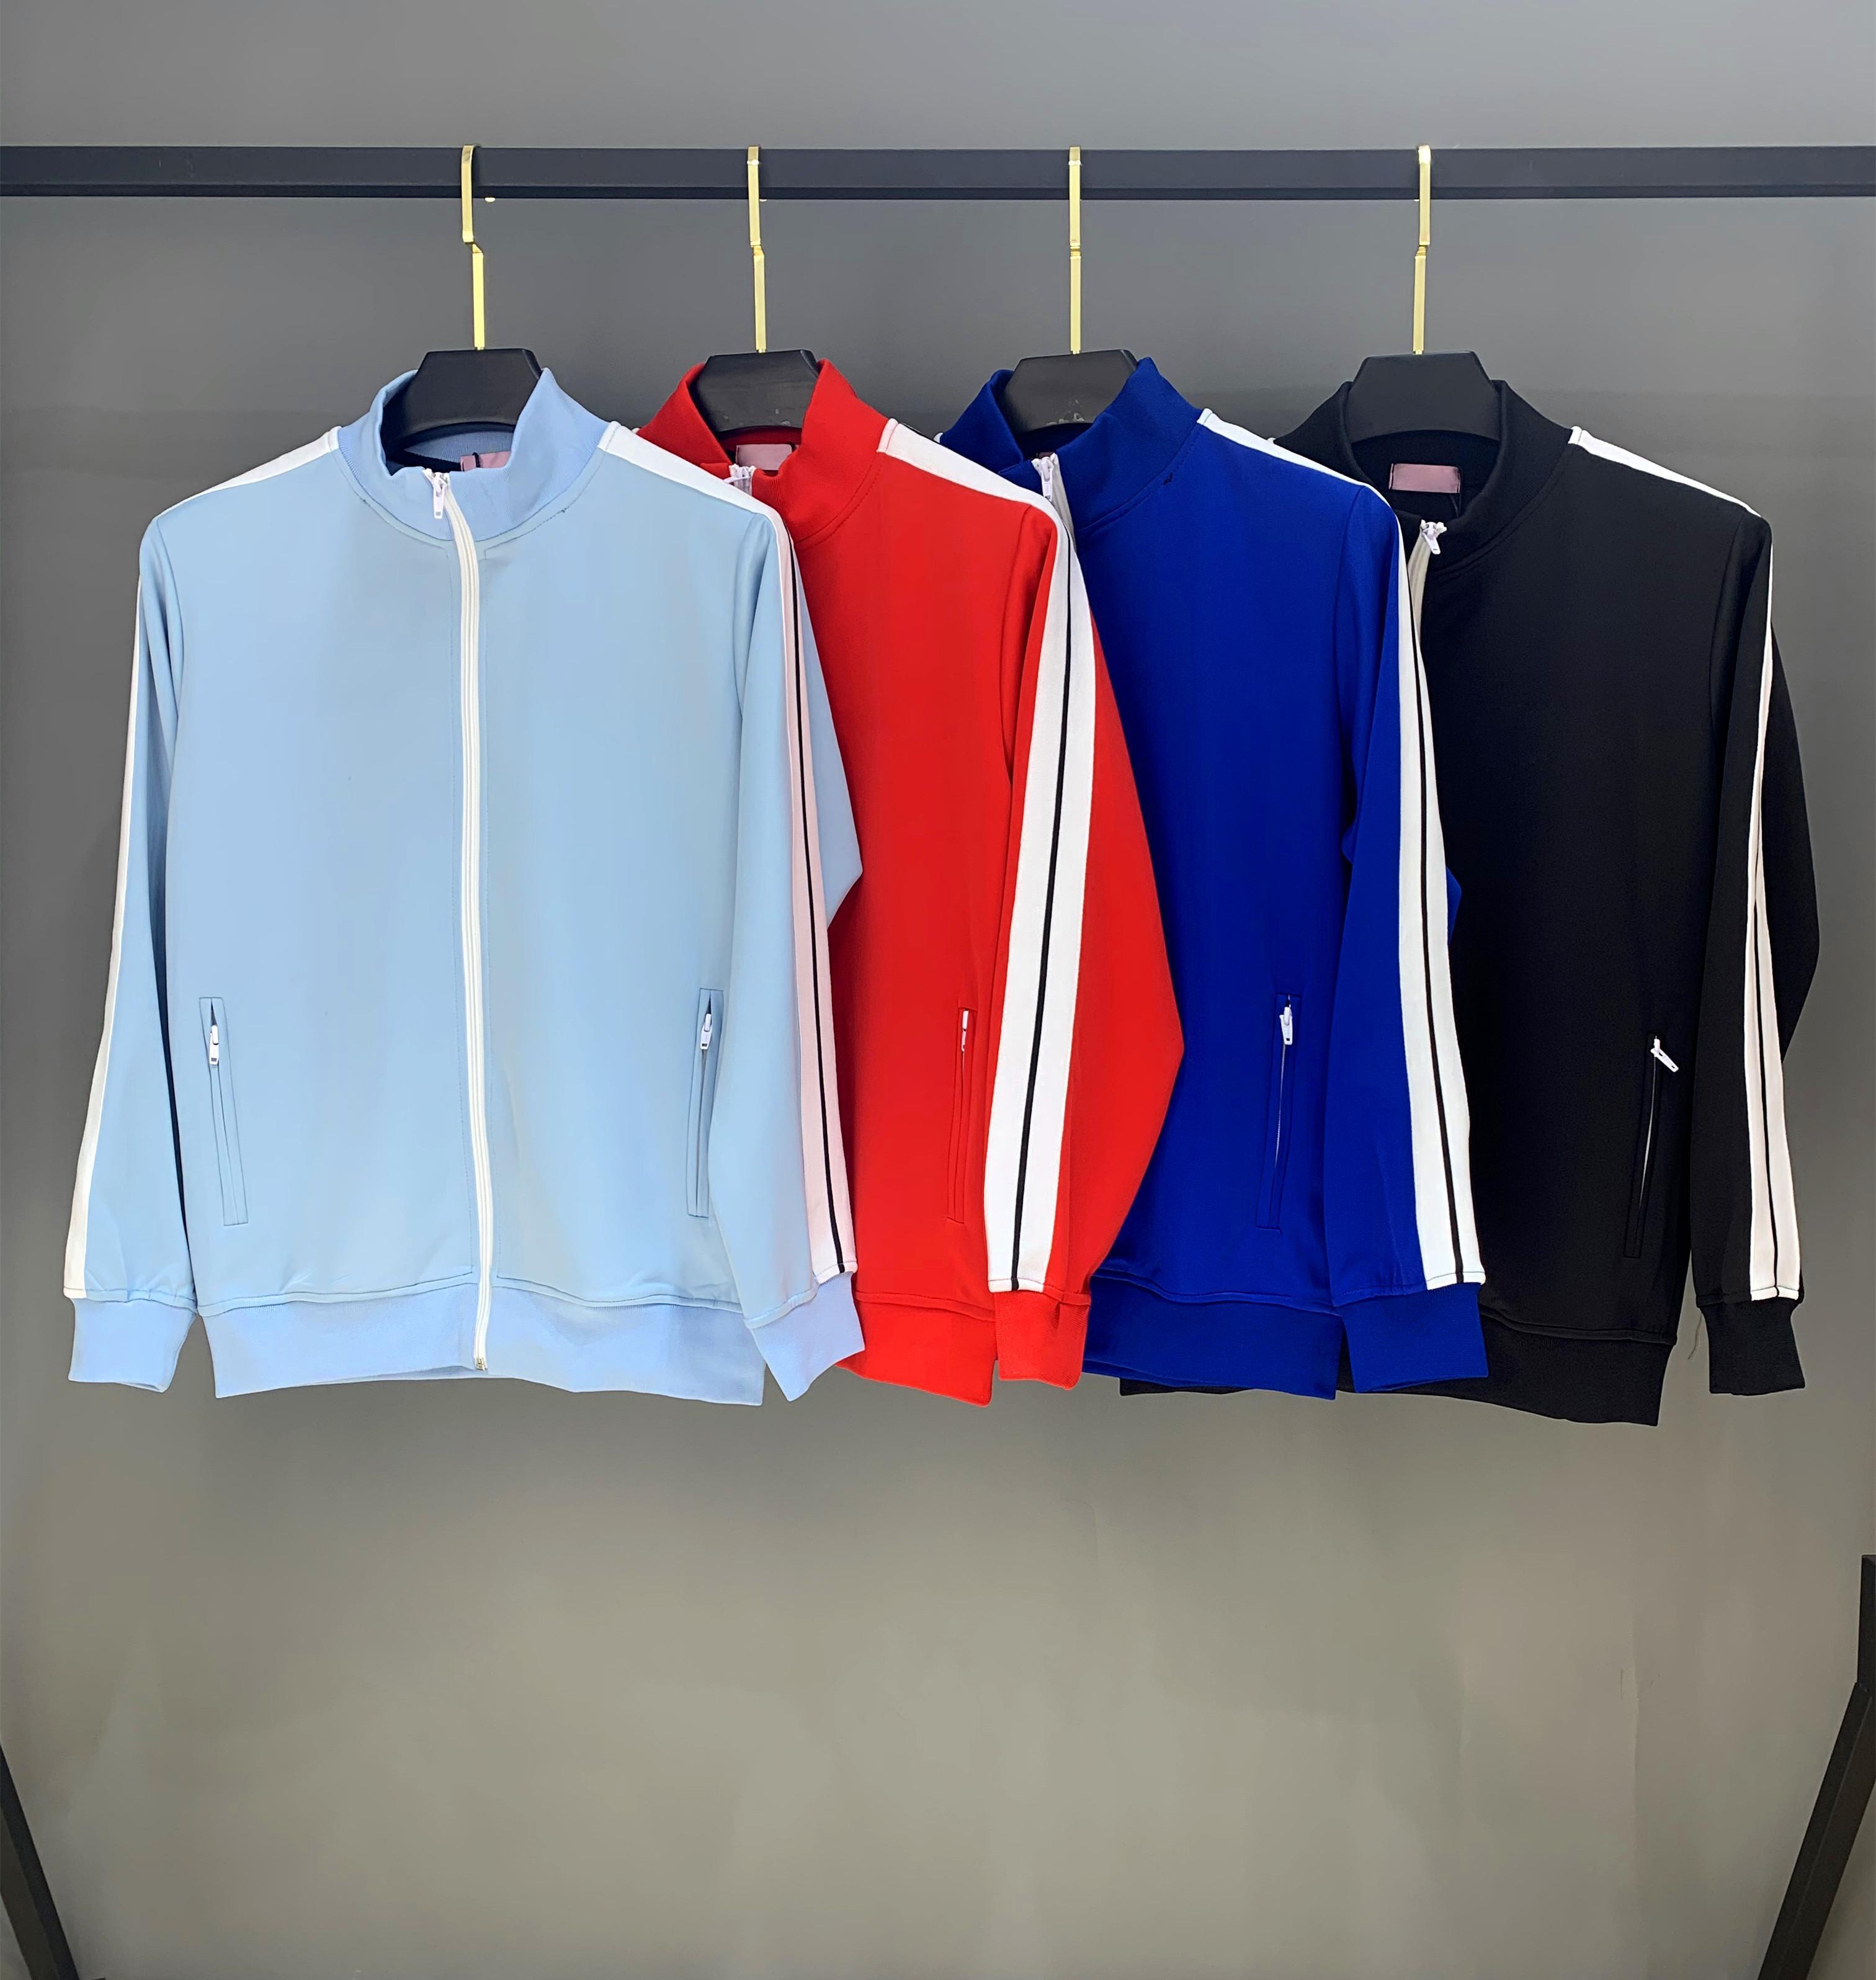 21ss Мужские дизайнеры Одежда Womens Cousssit Мужская куртка Толстоустойчивые Костюмы или брюки Мужчины S Одежда Sportswear Толстовки Tracksuits Евро Размер S-XL